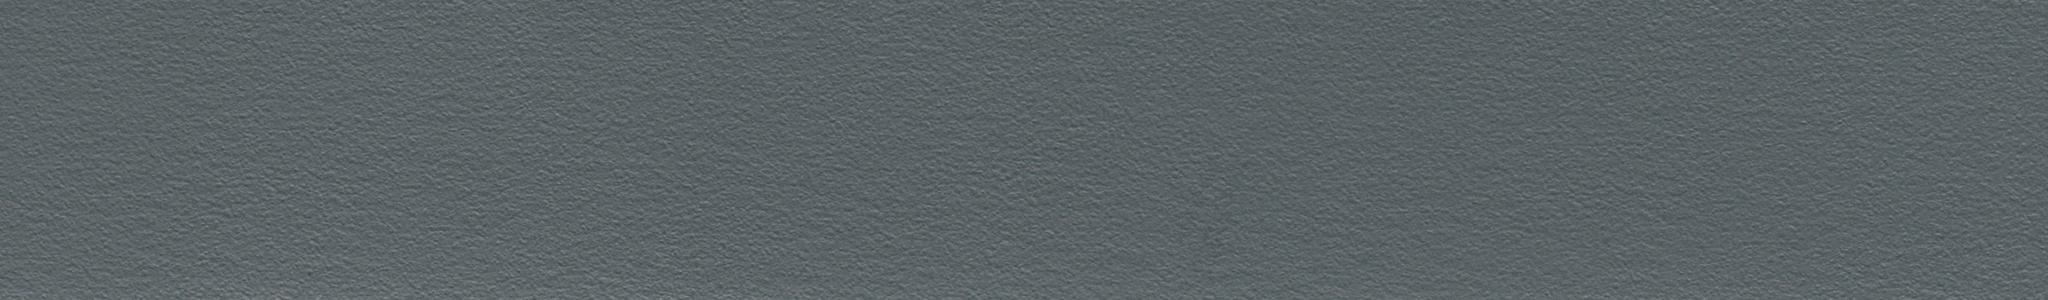 HU 166735 ABS Edge Green Soft Pearl 107